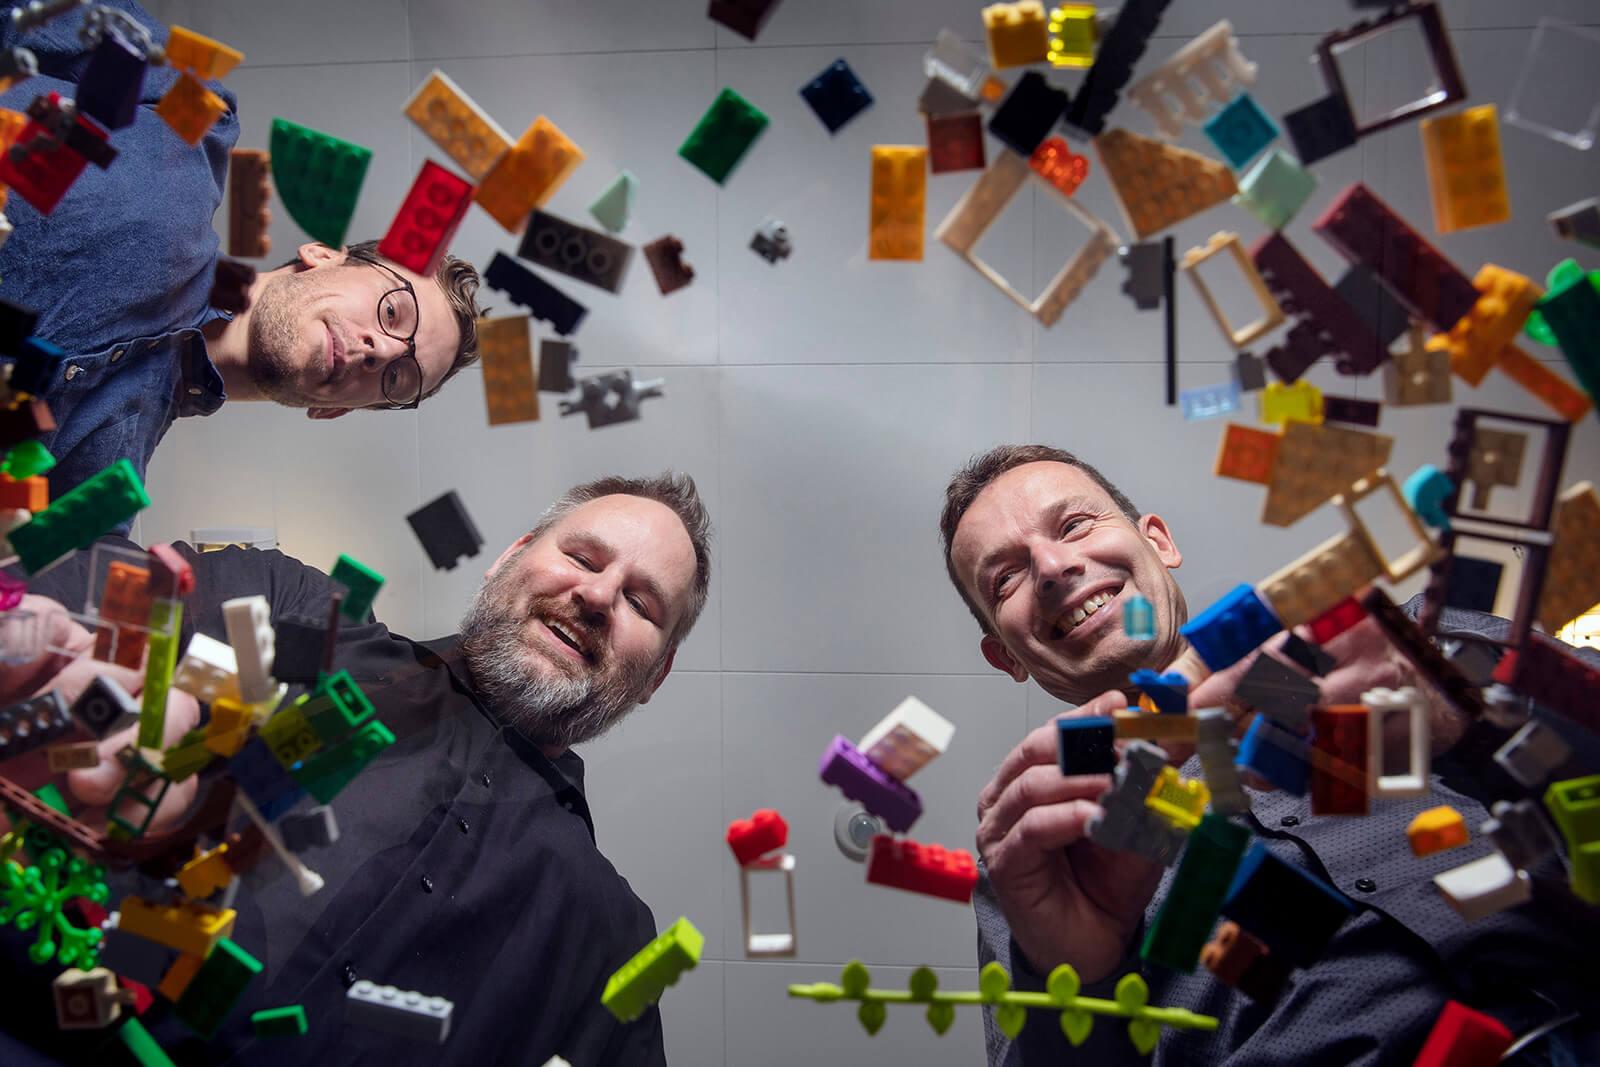 Kemiingeniør og ph.d.-studerende Emil Andersen, lektor ved institut for ingeniørvidenskab Mogens Hinge, senior projektleder ved LEGO René Mikkelsen.